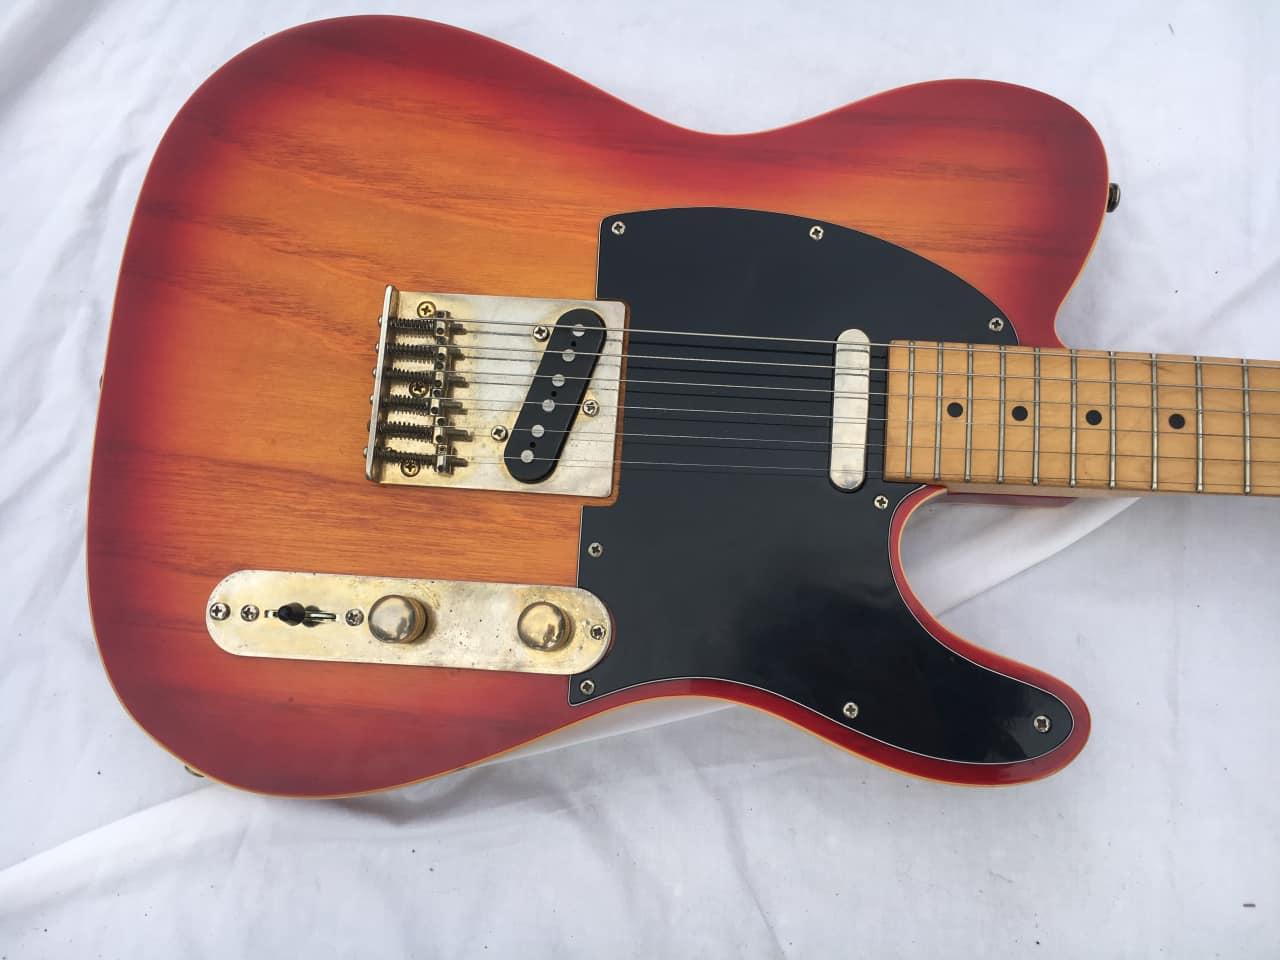 cort telecaster copy electric guitar nice b major music reverb. Black Bedroom Furniture Sets. Home Design Ideas